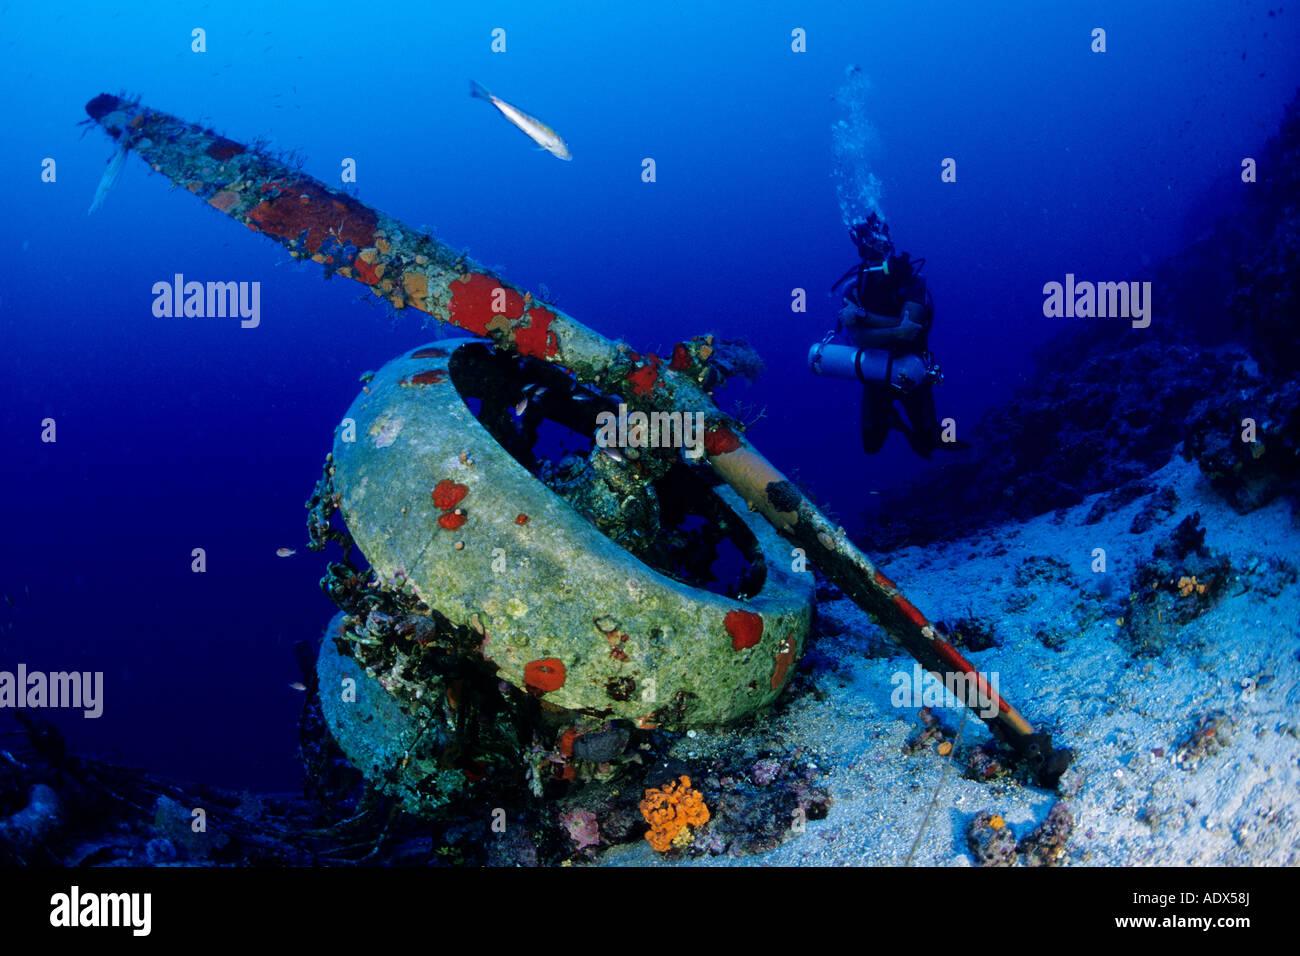 Savoia marchetti sm 79 gobba page 4 - Scuba Diver At Airplane Wreck Savoia Marchetti Sm 79 4 Kas Lycia Region Mediterranean Sea Turkey